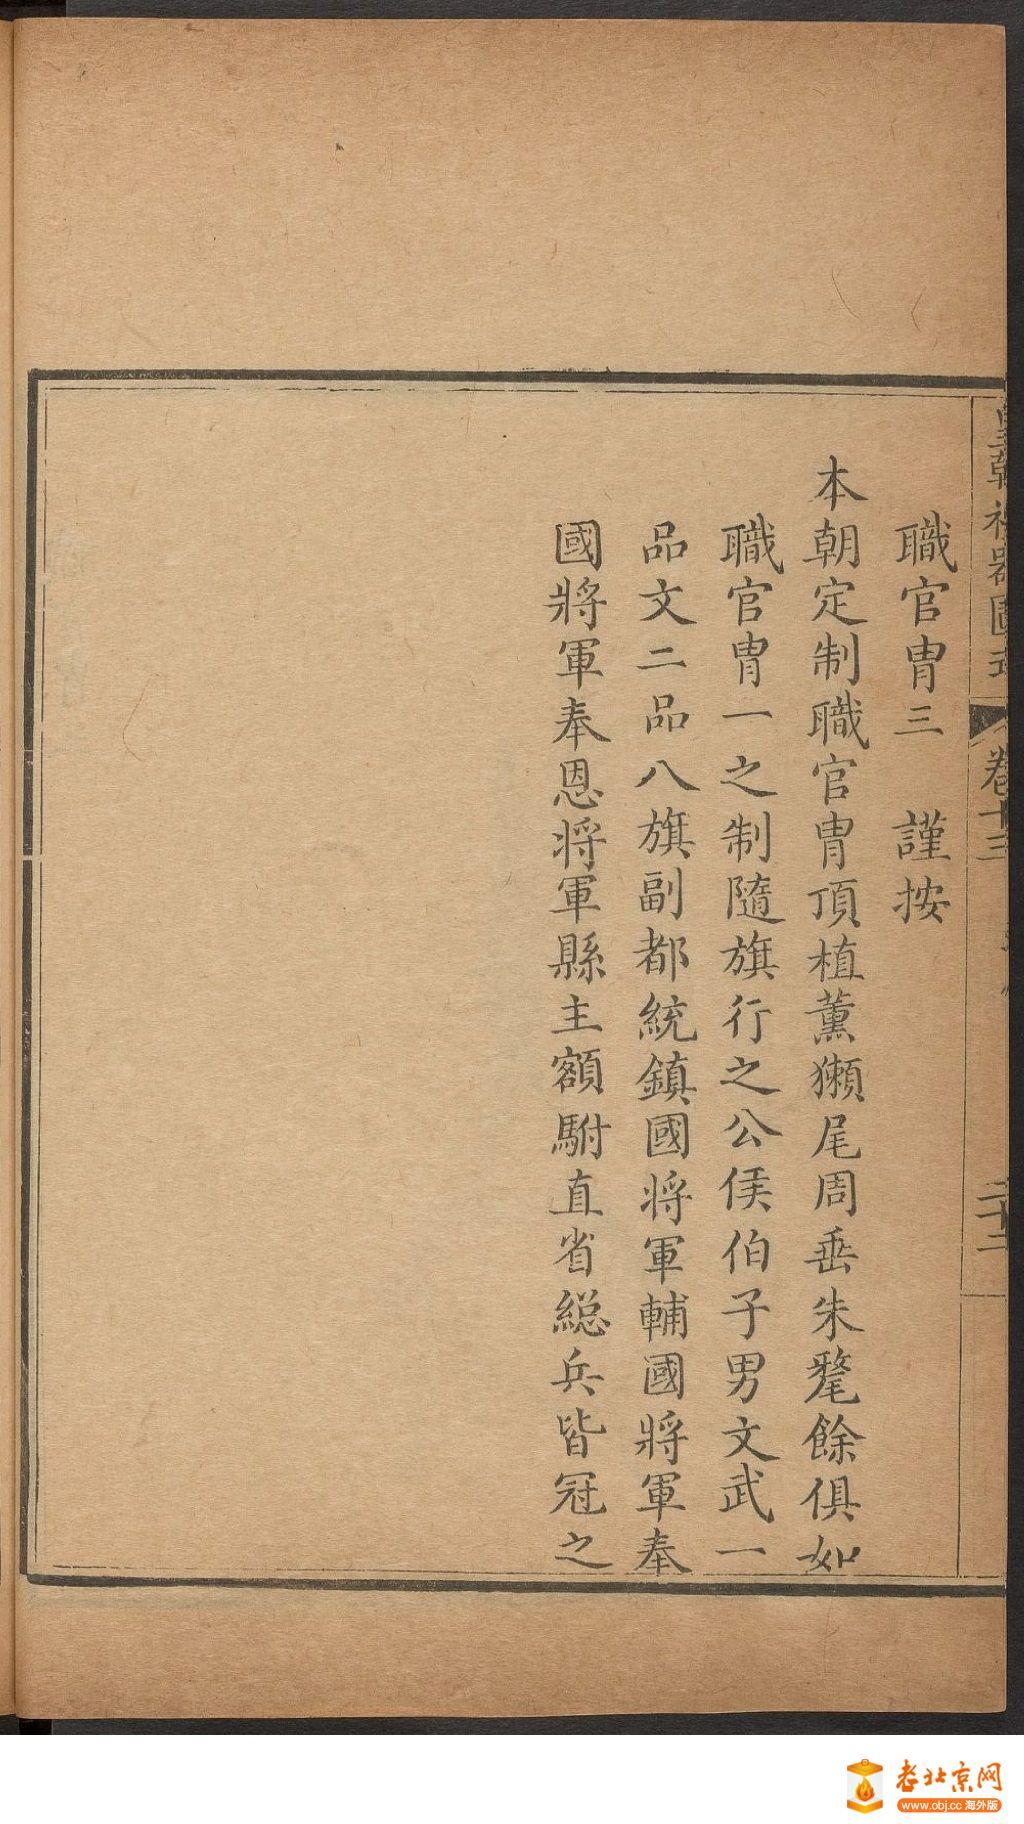 3_page3_image1b.jpg